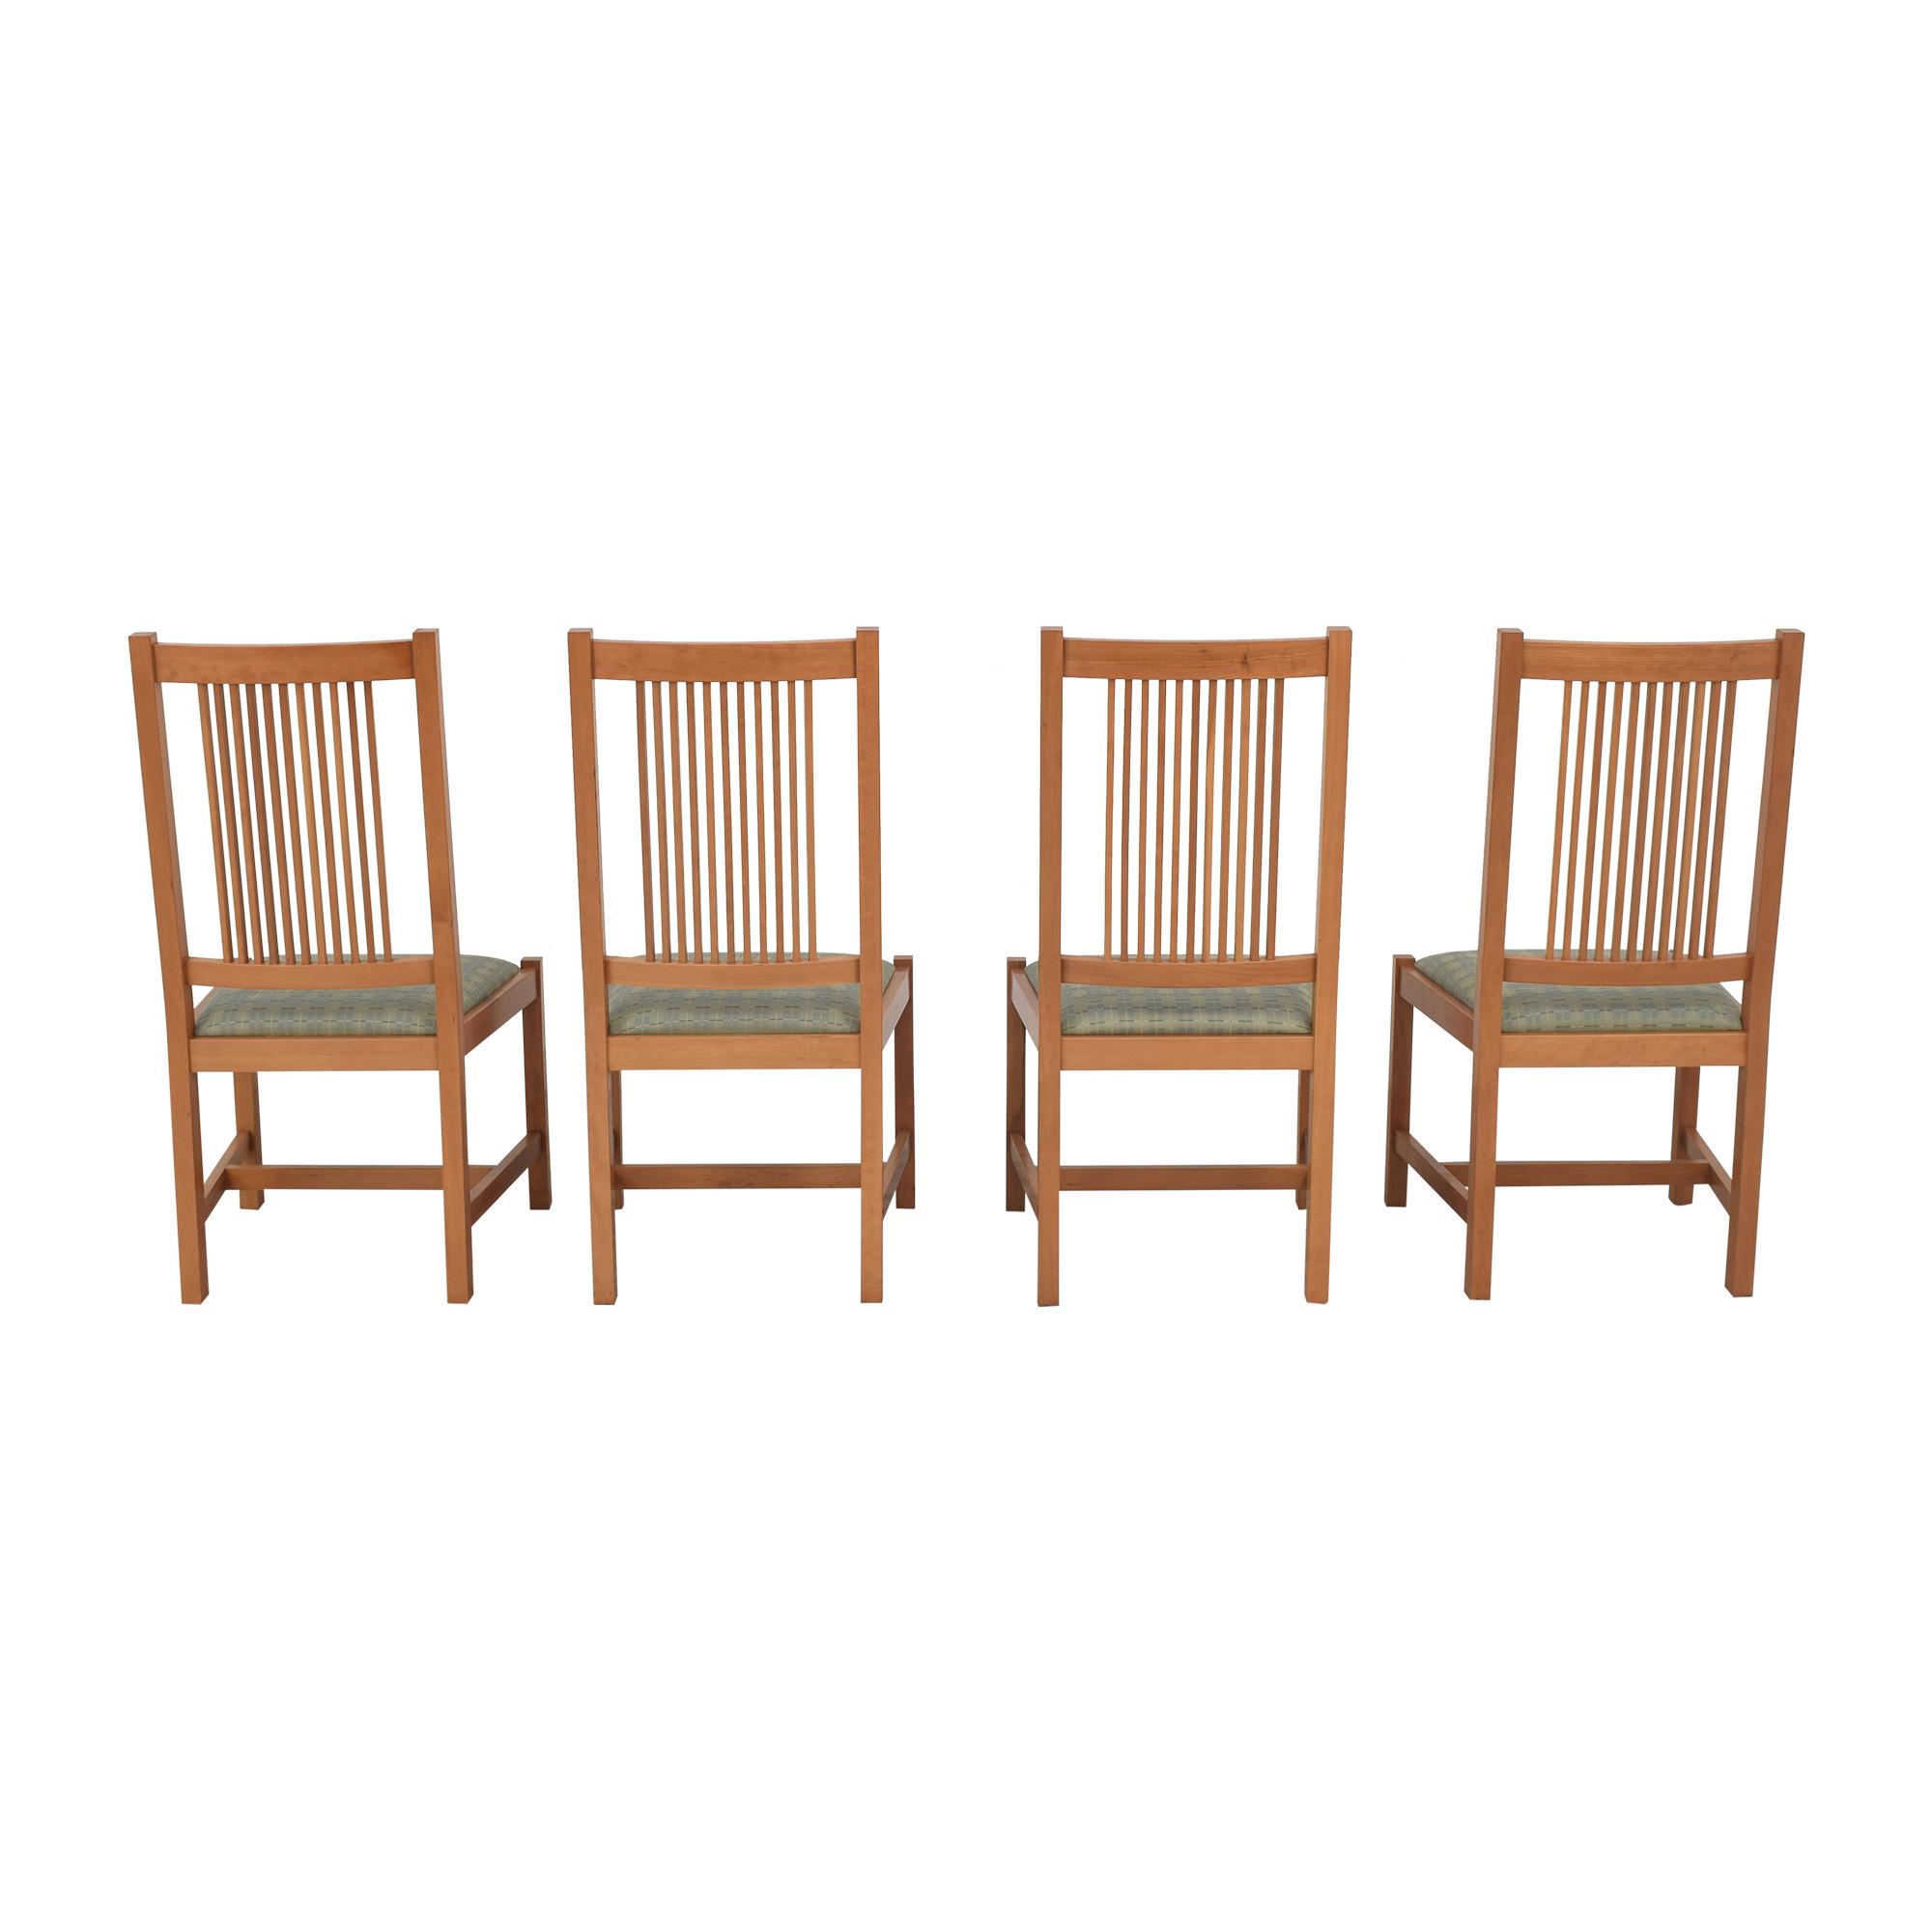 Scott Jordan Furniture Scott Jordan Mission Style Dining Chairs coupon